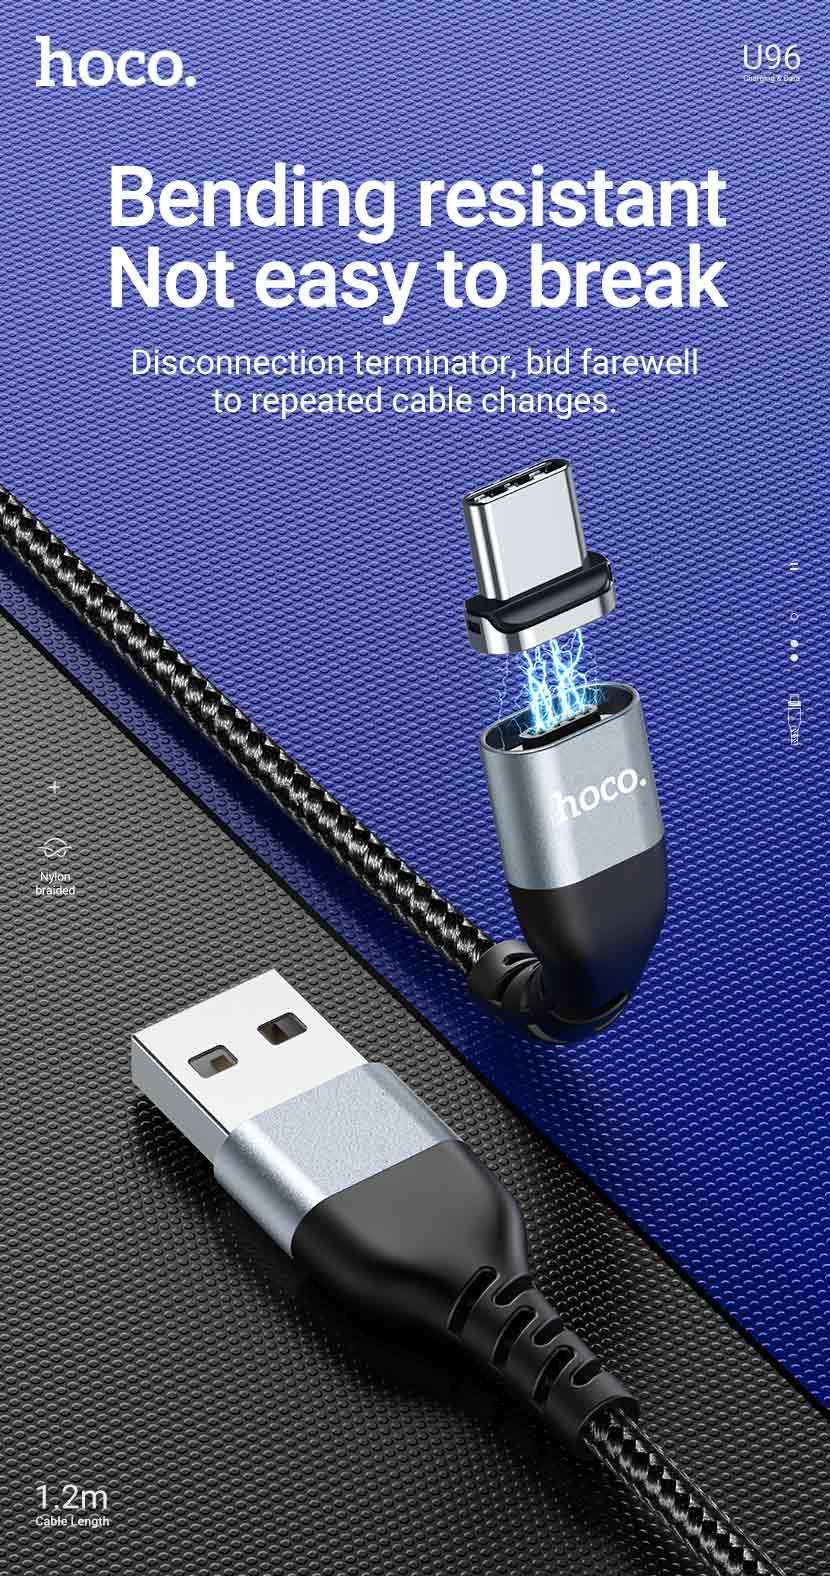 hoco news u96 traveller magnetic charging data cable bending resistant en